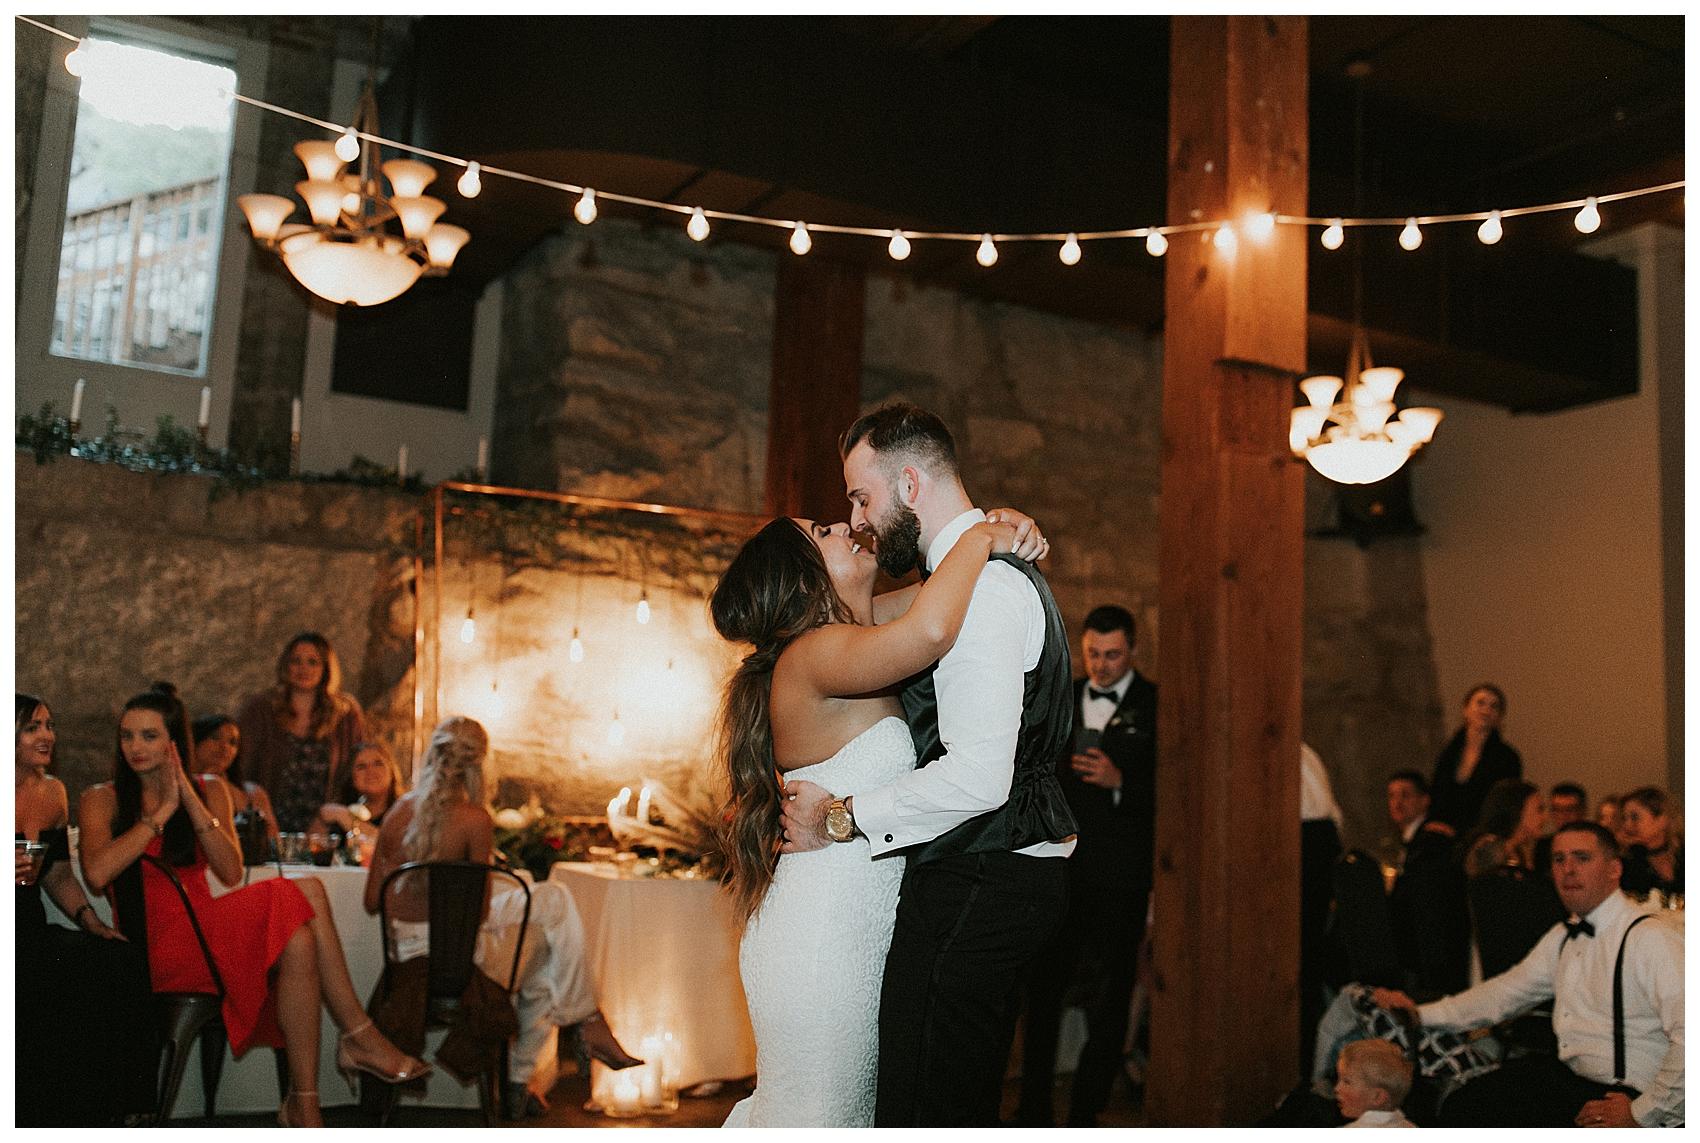 Chateau Rive Spokane Wedding Cassie Trottier Photography01113.jpg